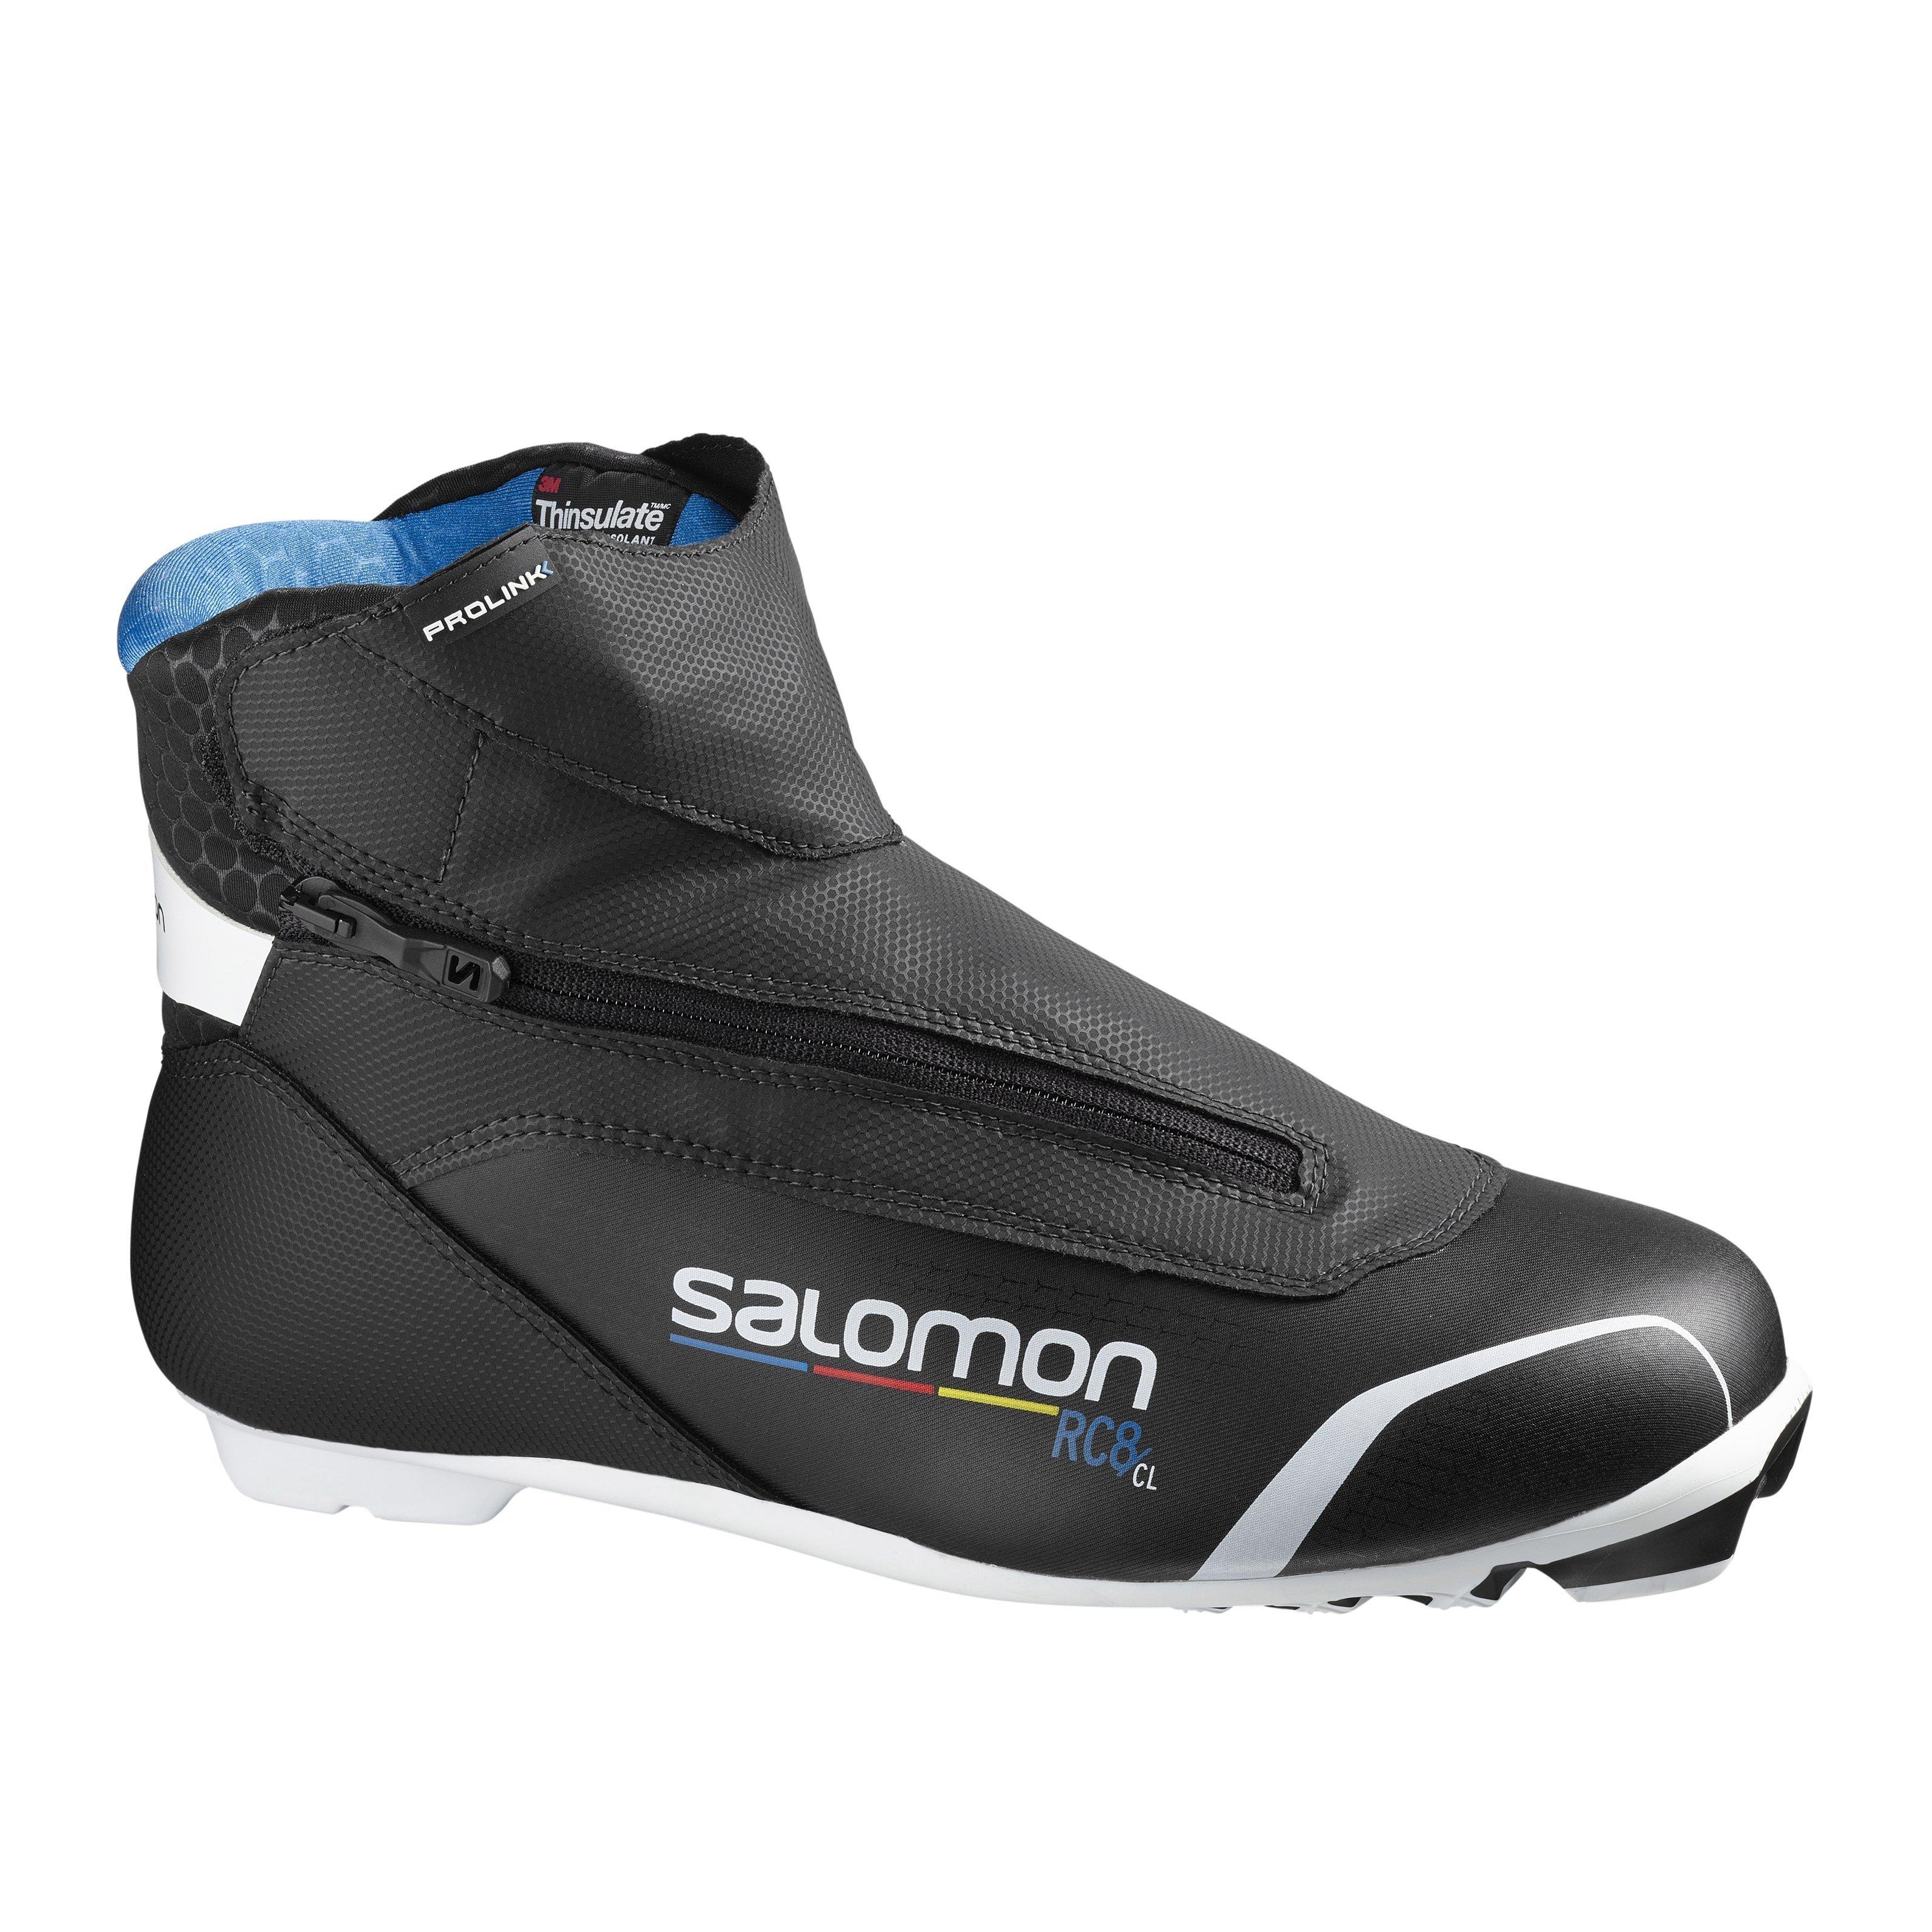 09452f641233 Salomon RS8 Prolink L40554700 18 19